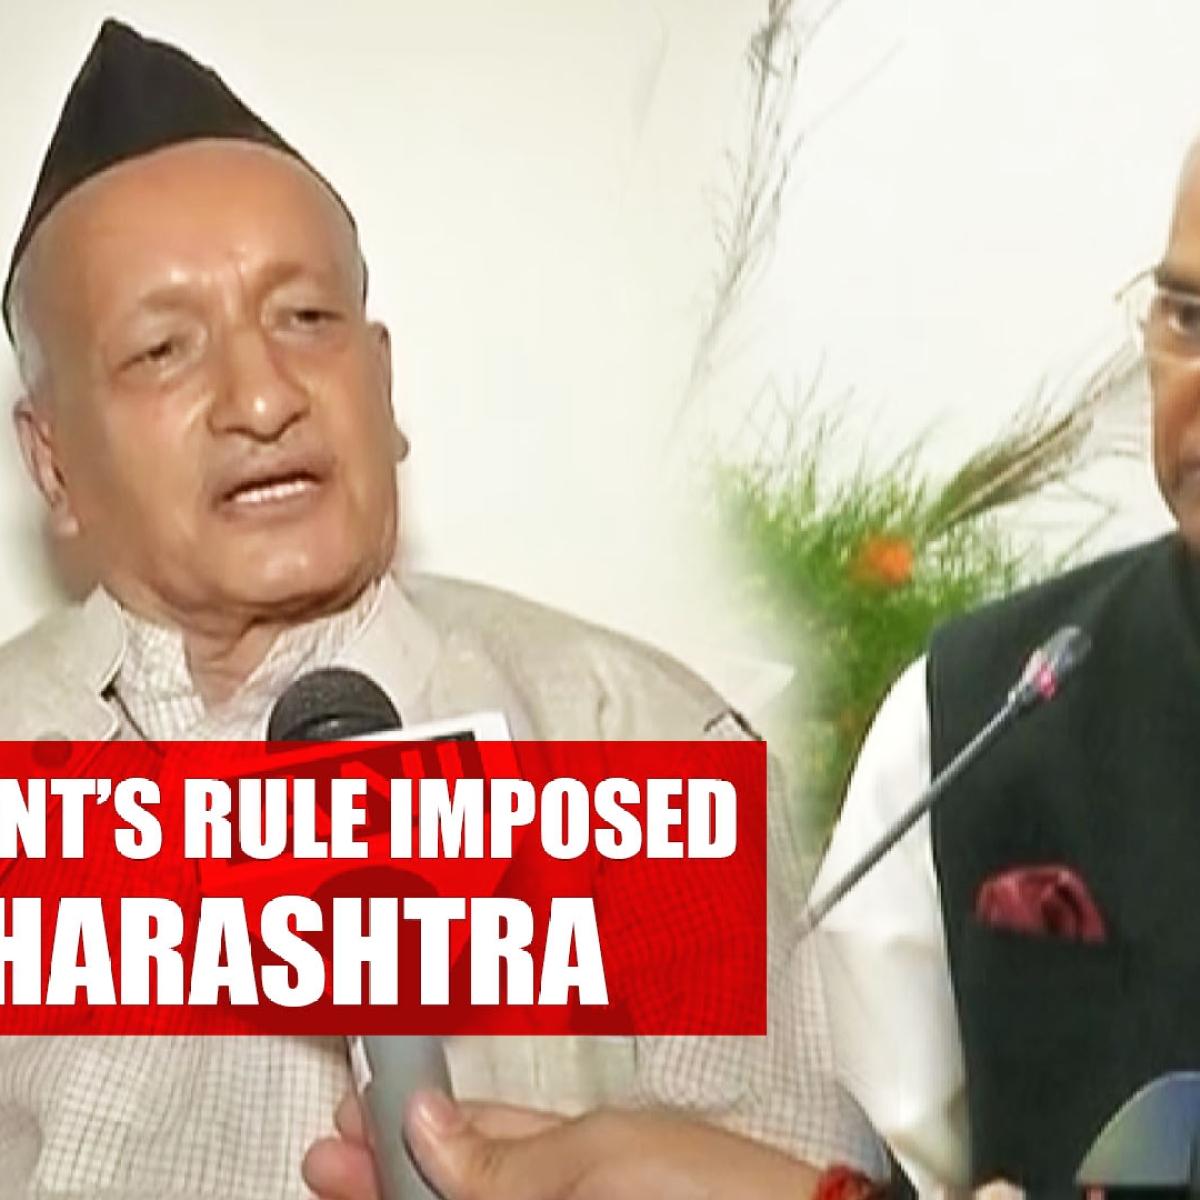 President's Rule Imposed In Maharashtra Amid Power Struggle